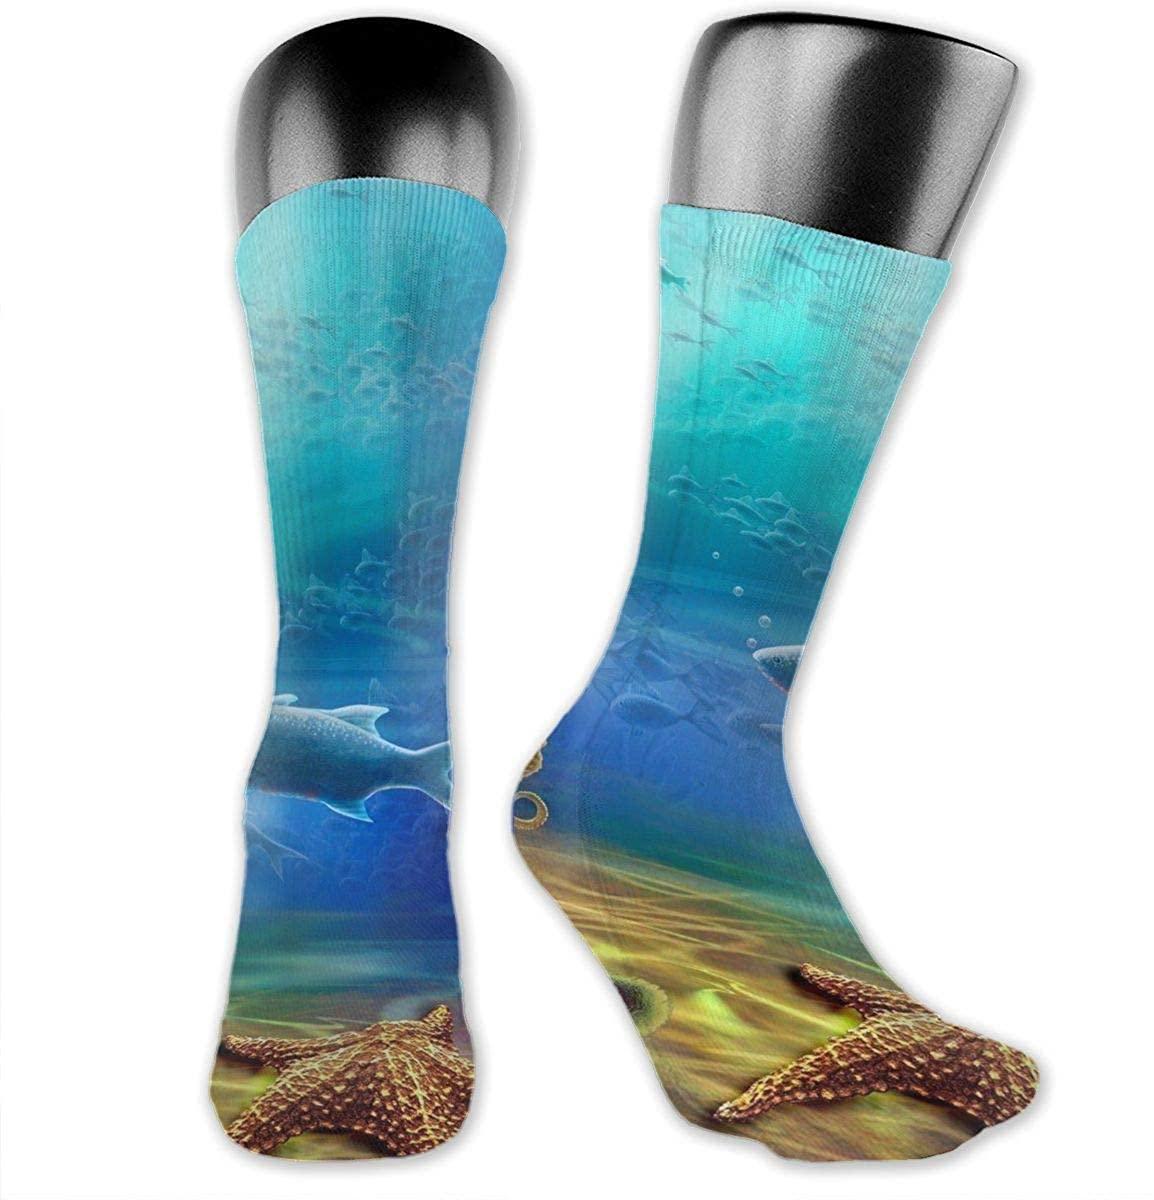 Field Rain Shark Unisex Outdoor Adult Sport Over-The-Calf Long Tube Stockings Crew Socks